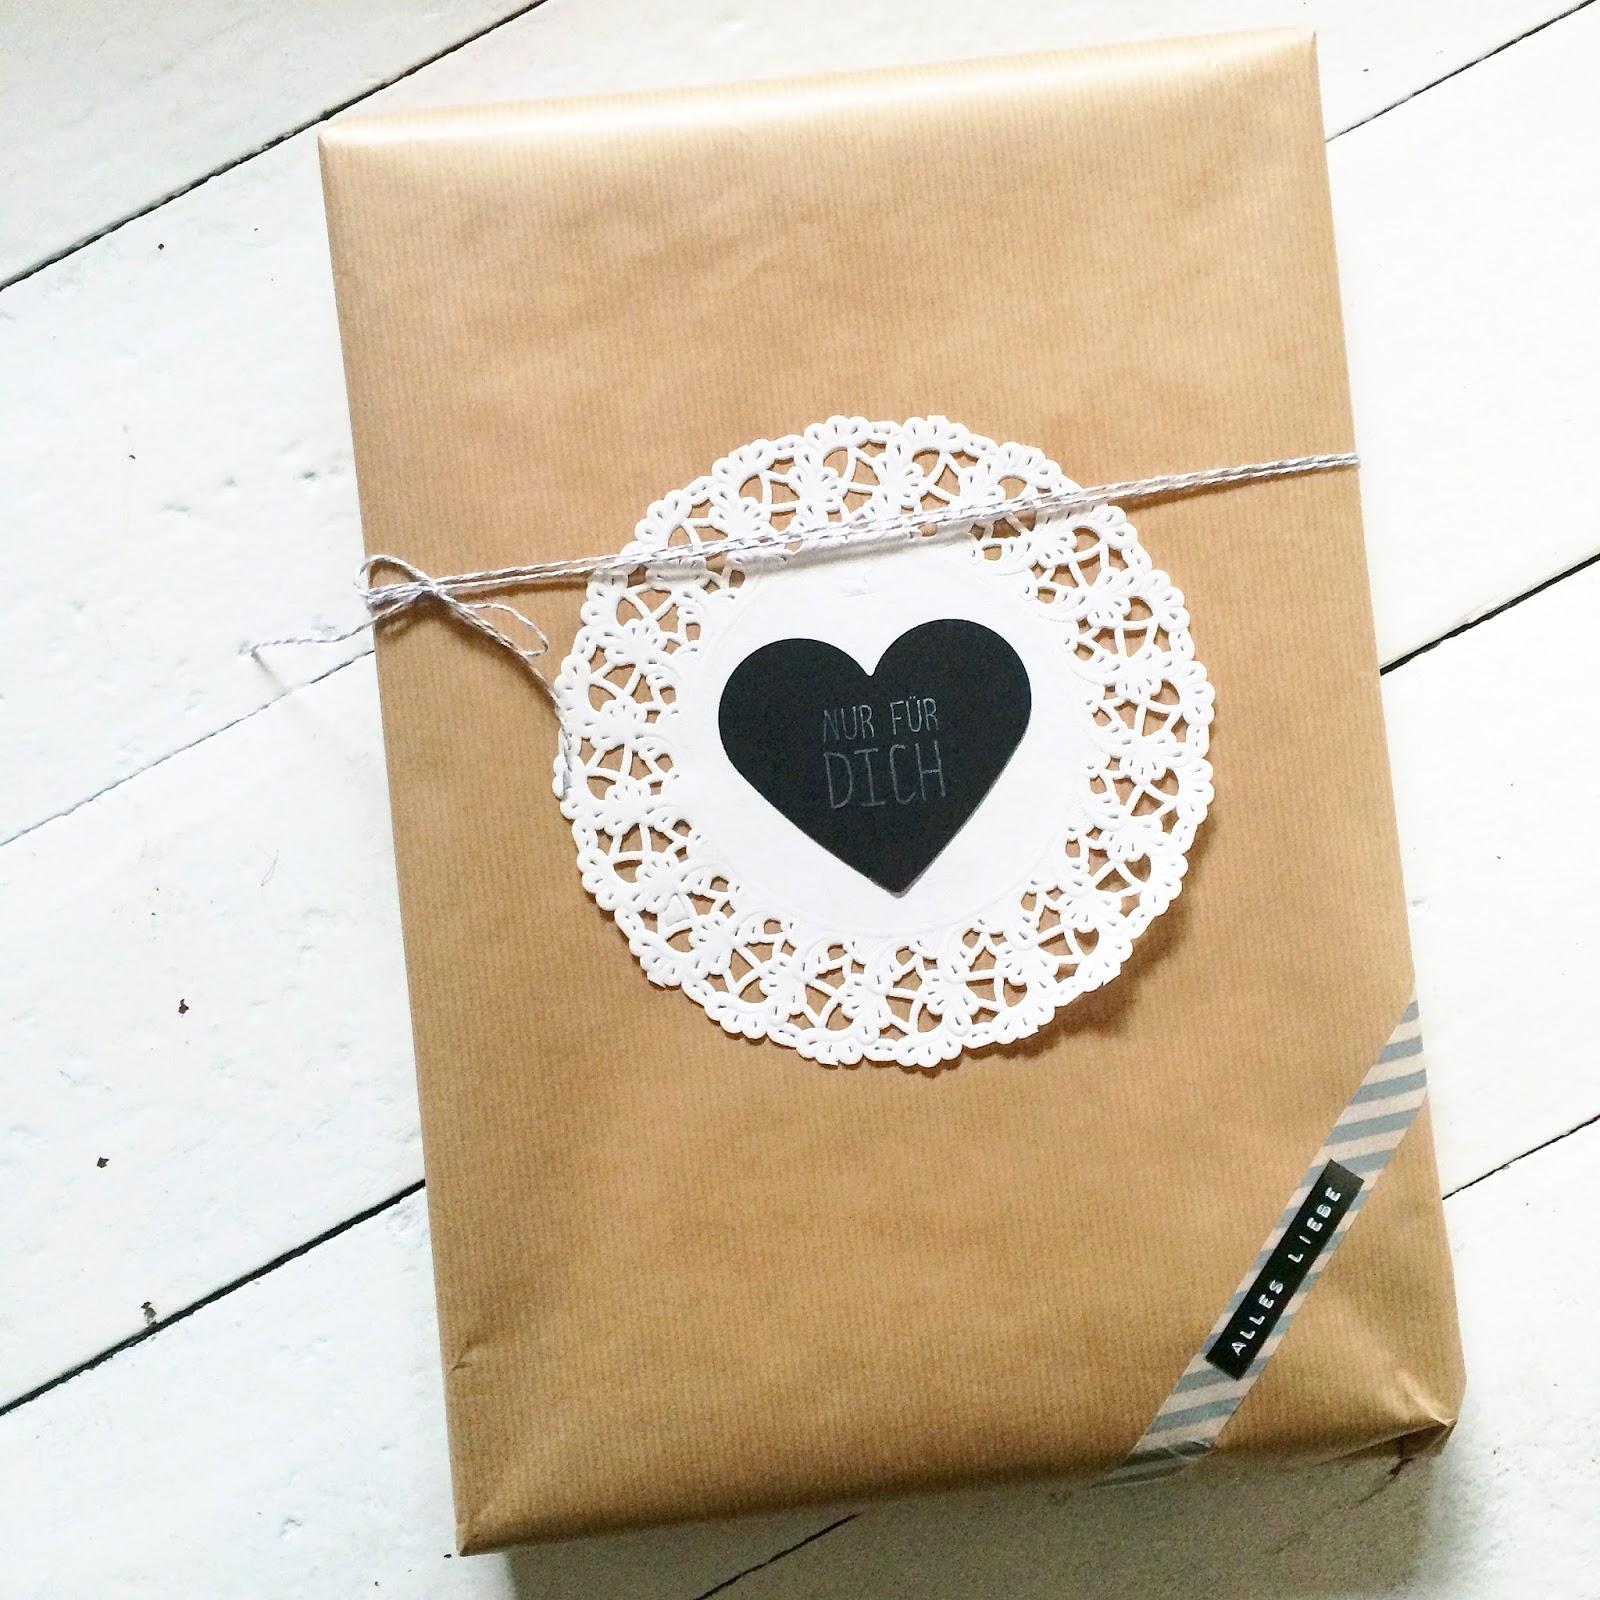 Mmi, Mittwochs mag ich, Packpapier, Tortenspitze, Geschenke kreativ verpackt, DIY, Stempel, Masking Tape, Bäckergarn, Label, Etikett, Verpackungsidee, DIY, basteln